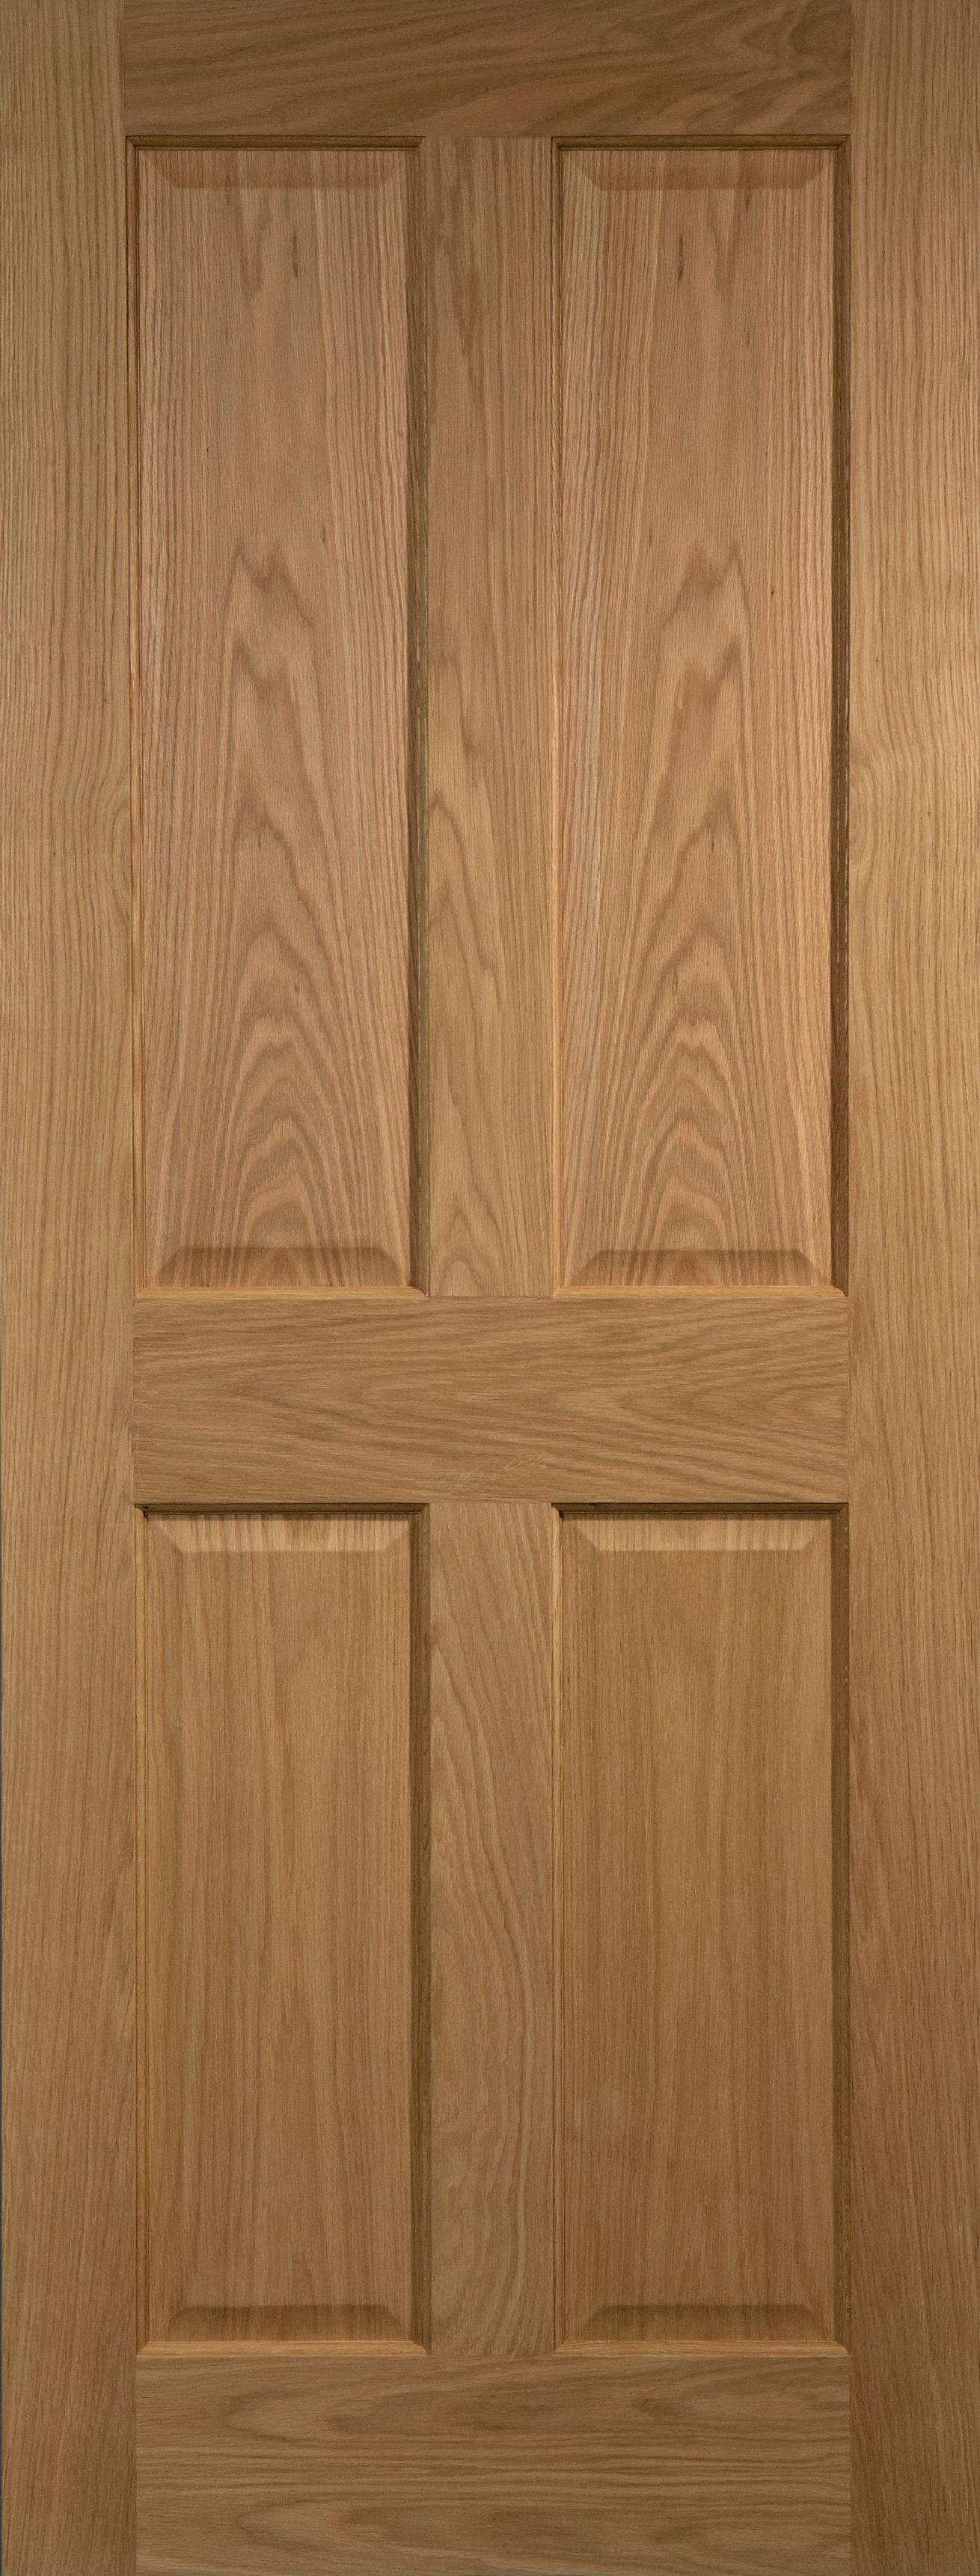 4 panel prefinished oak unglazed internal standard door h1981mm 4 panel prefinished oak unglazed internal standard door h1981mm w762mm departments diy at bq eventelaan Choice Image